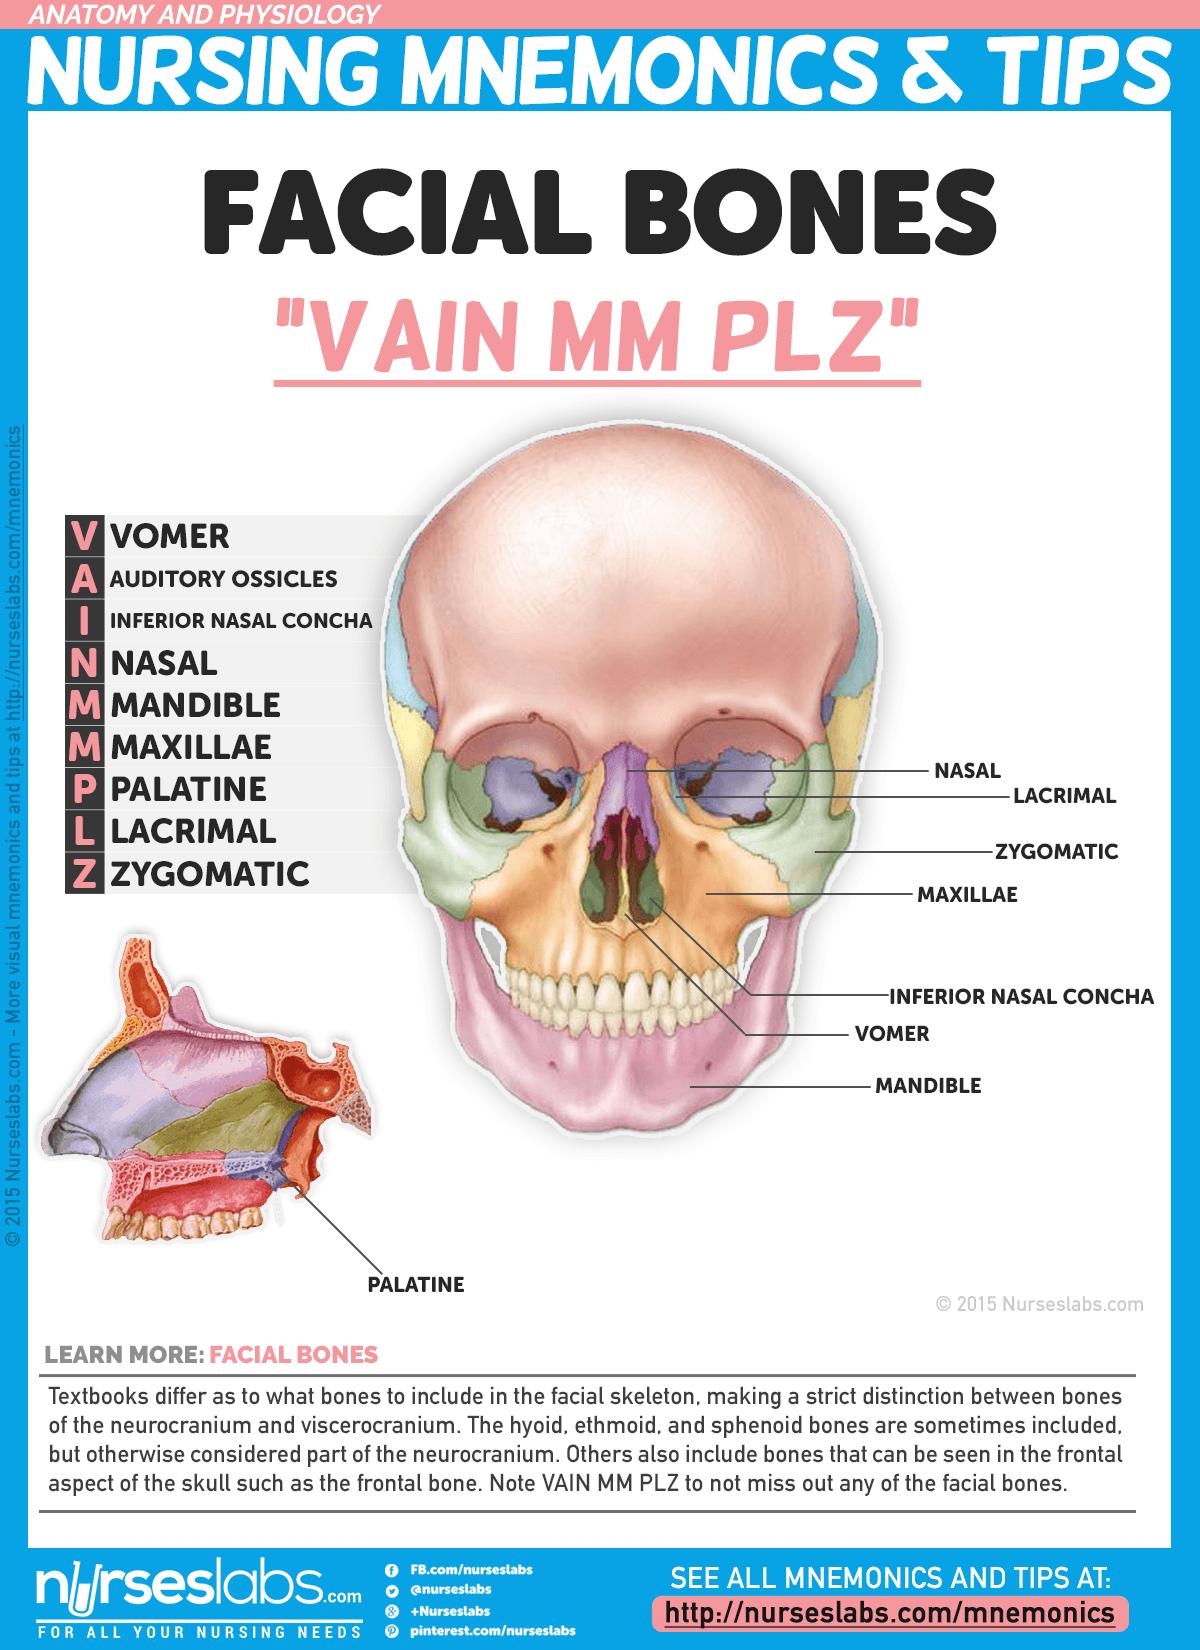 Pin de radhe shyam en medical | Pinterest | Anatomía y Varios